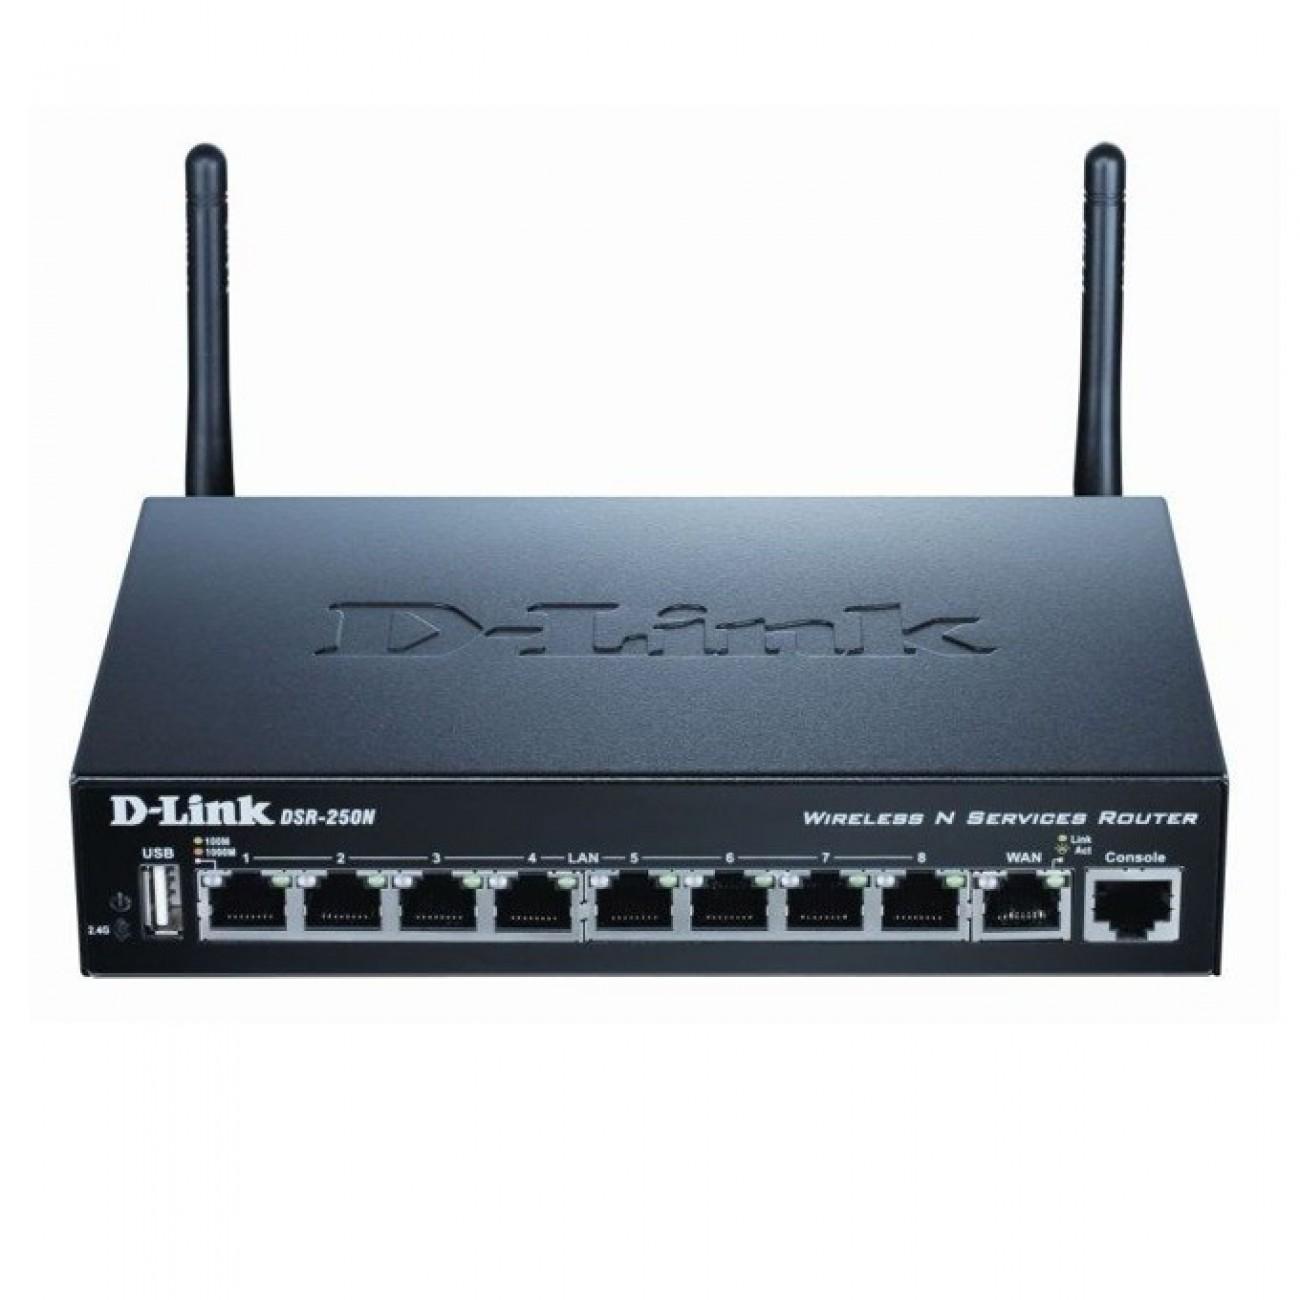 Рутер D-Link DSR-250N, 300 Mbps, 2.4GHz(300 Mbps), Wireless N, 8x LAN 1000, 1x WAN 1000, 1x USB 2.0, 2x външни антени в Рутери - безжични -  | Alleop